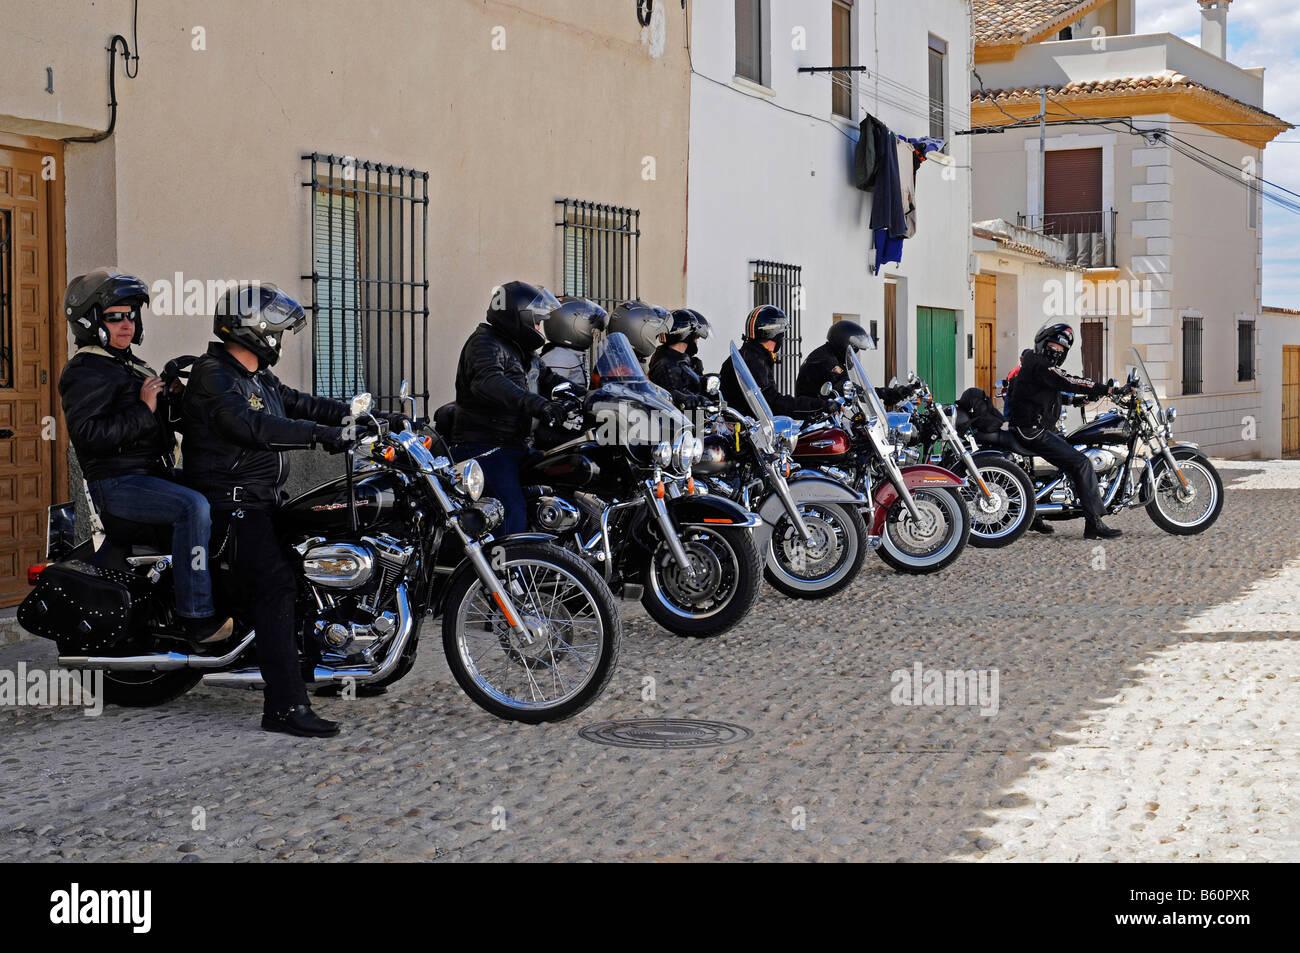 Harley Davidson, motorbikes, motorcyclists, parking, street, start, exhibition, motorbike excursion, Spain, Europe - Stock Image